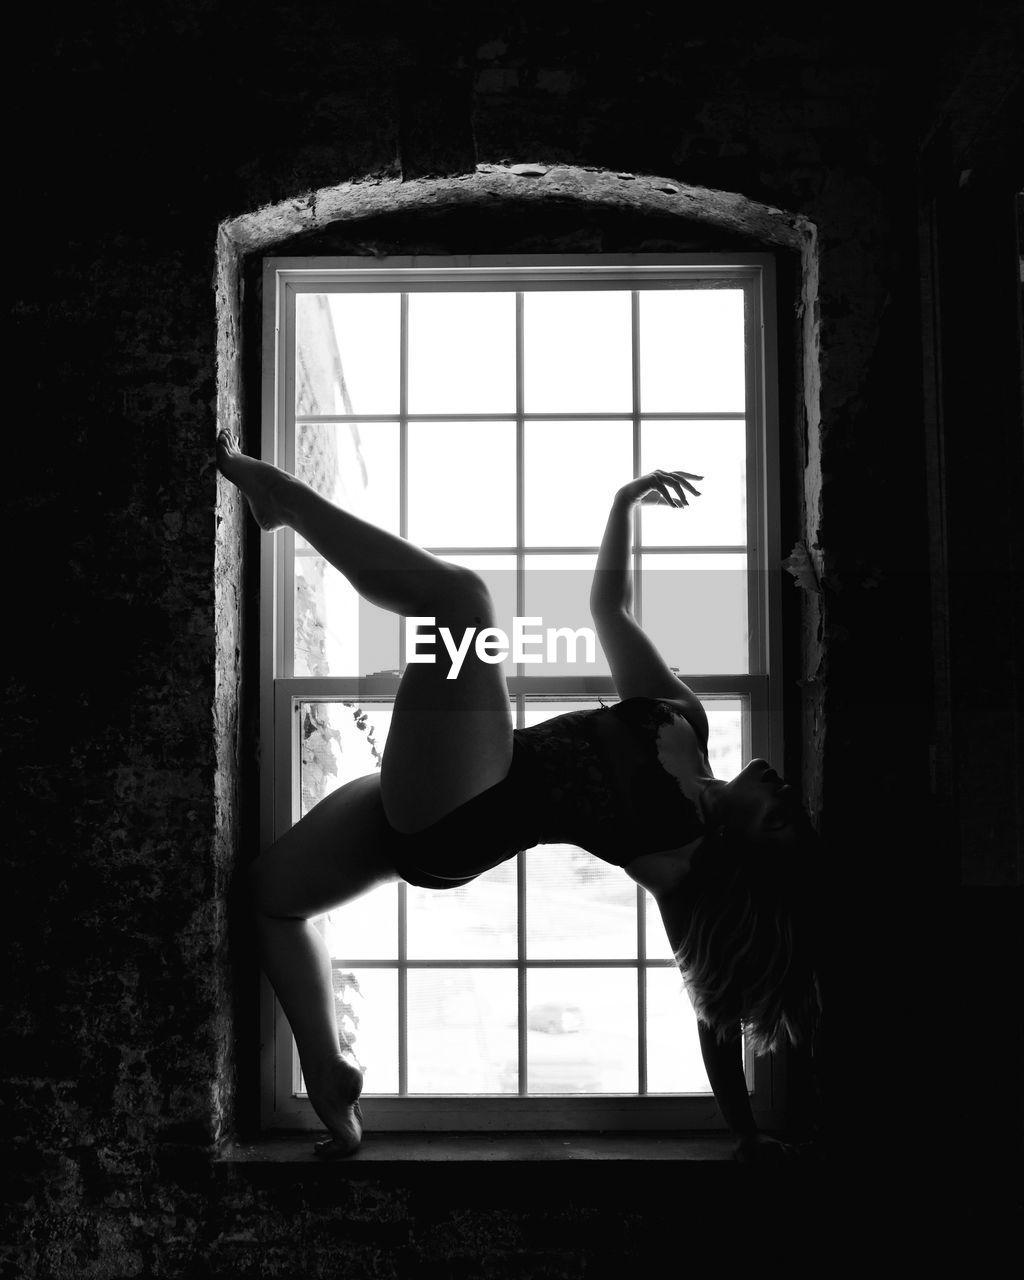 WOMAN LOOKING THROUGH WINDOW IN MIRROR